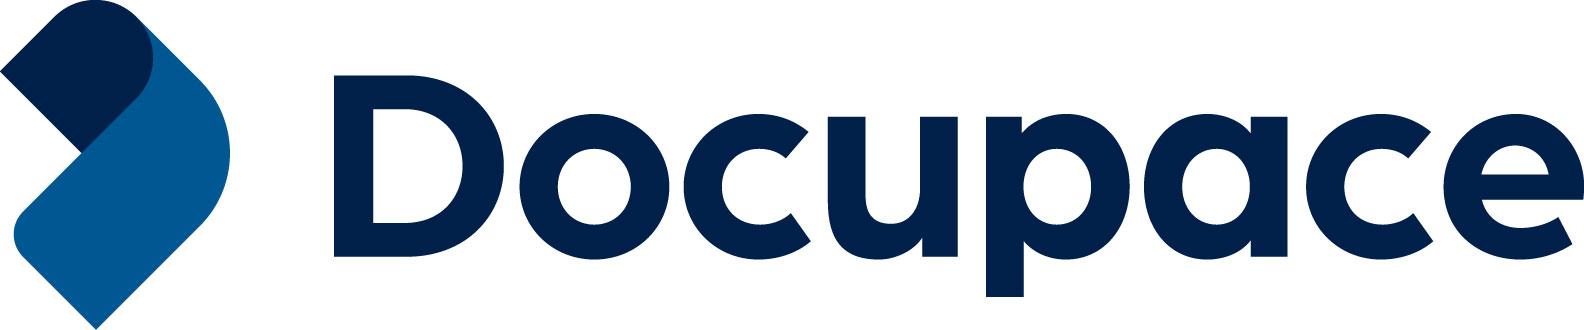 Docupace Technologies, LLC. logo